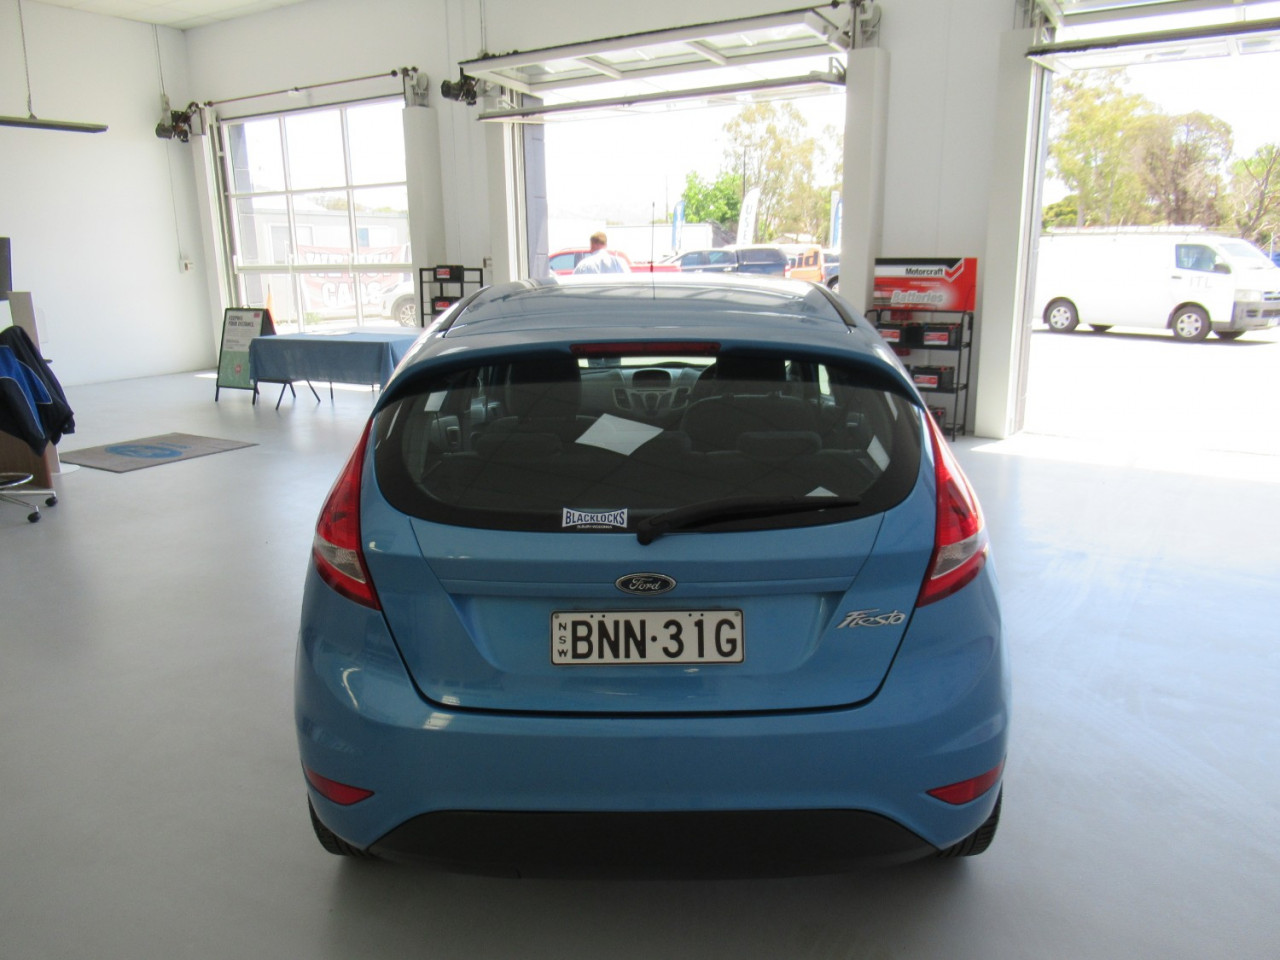 2009 Ford Fiesta WS CL Hatchback Image 7